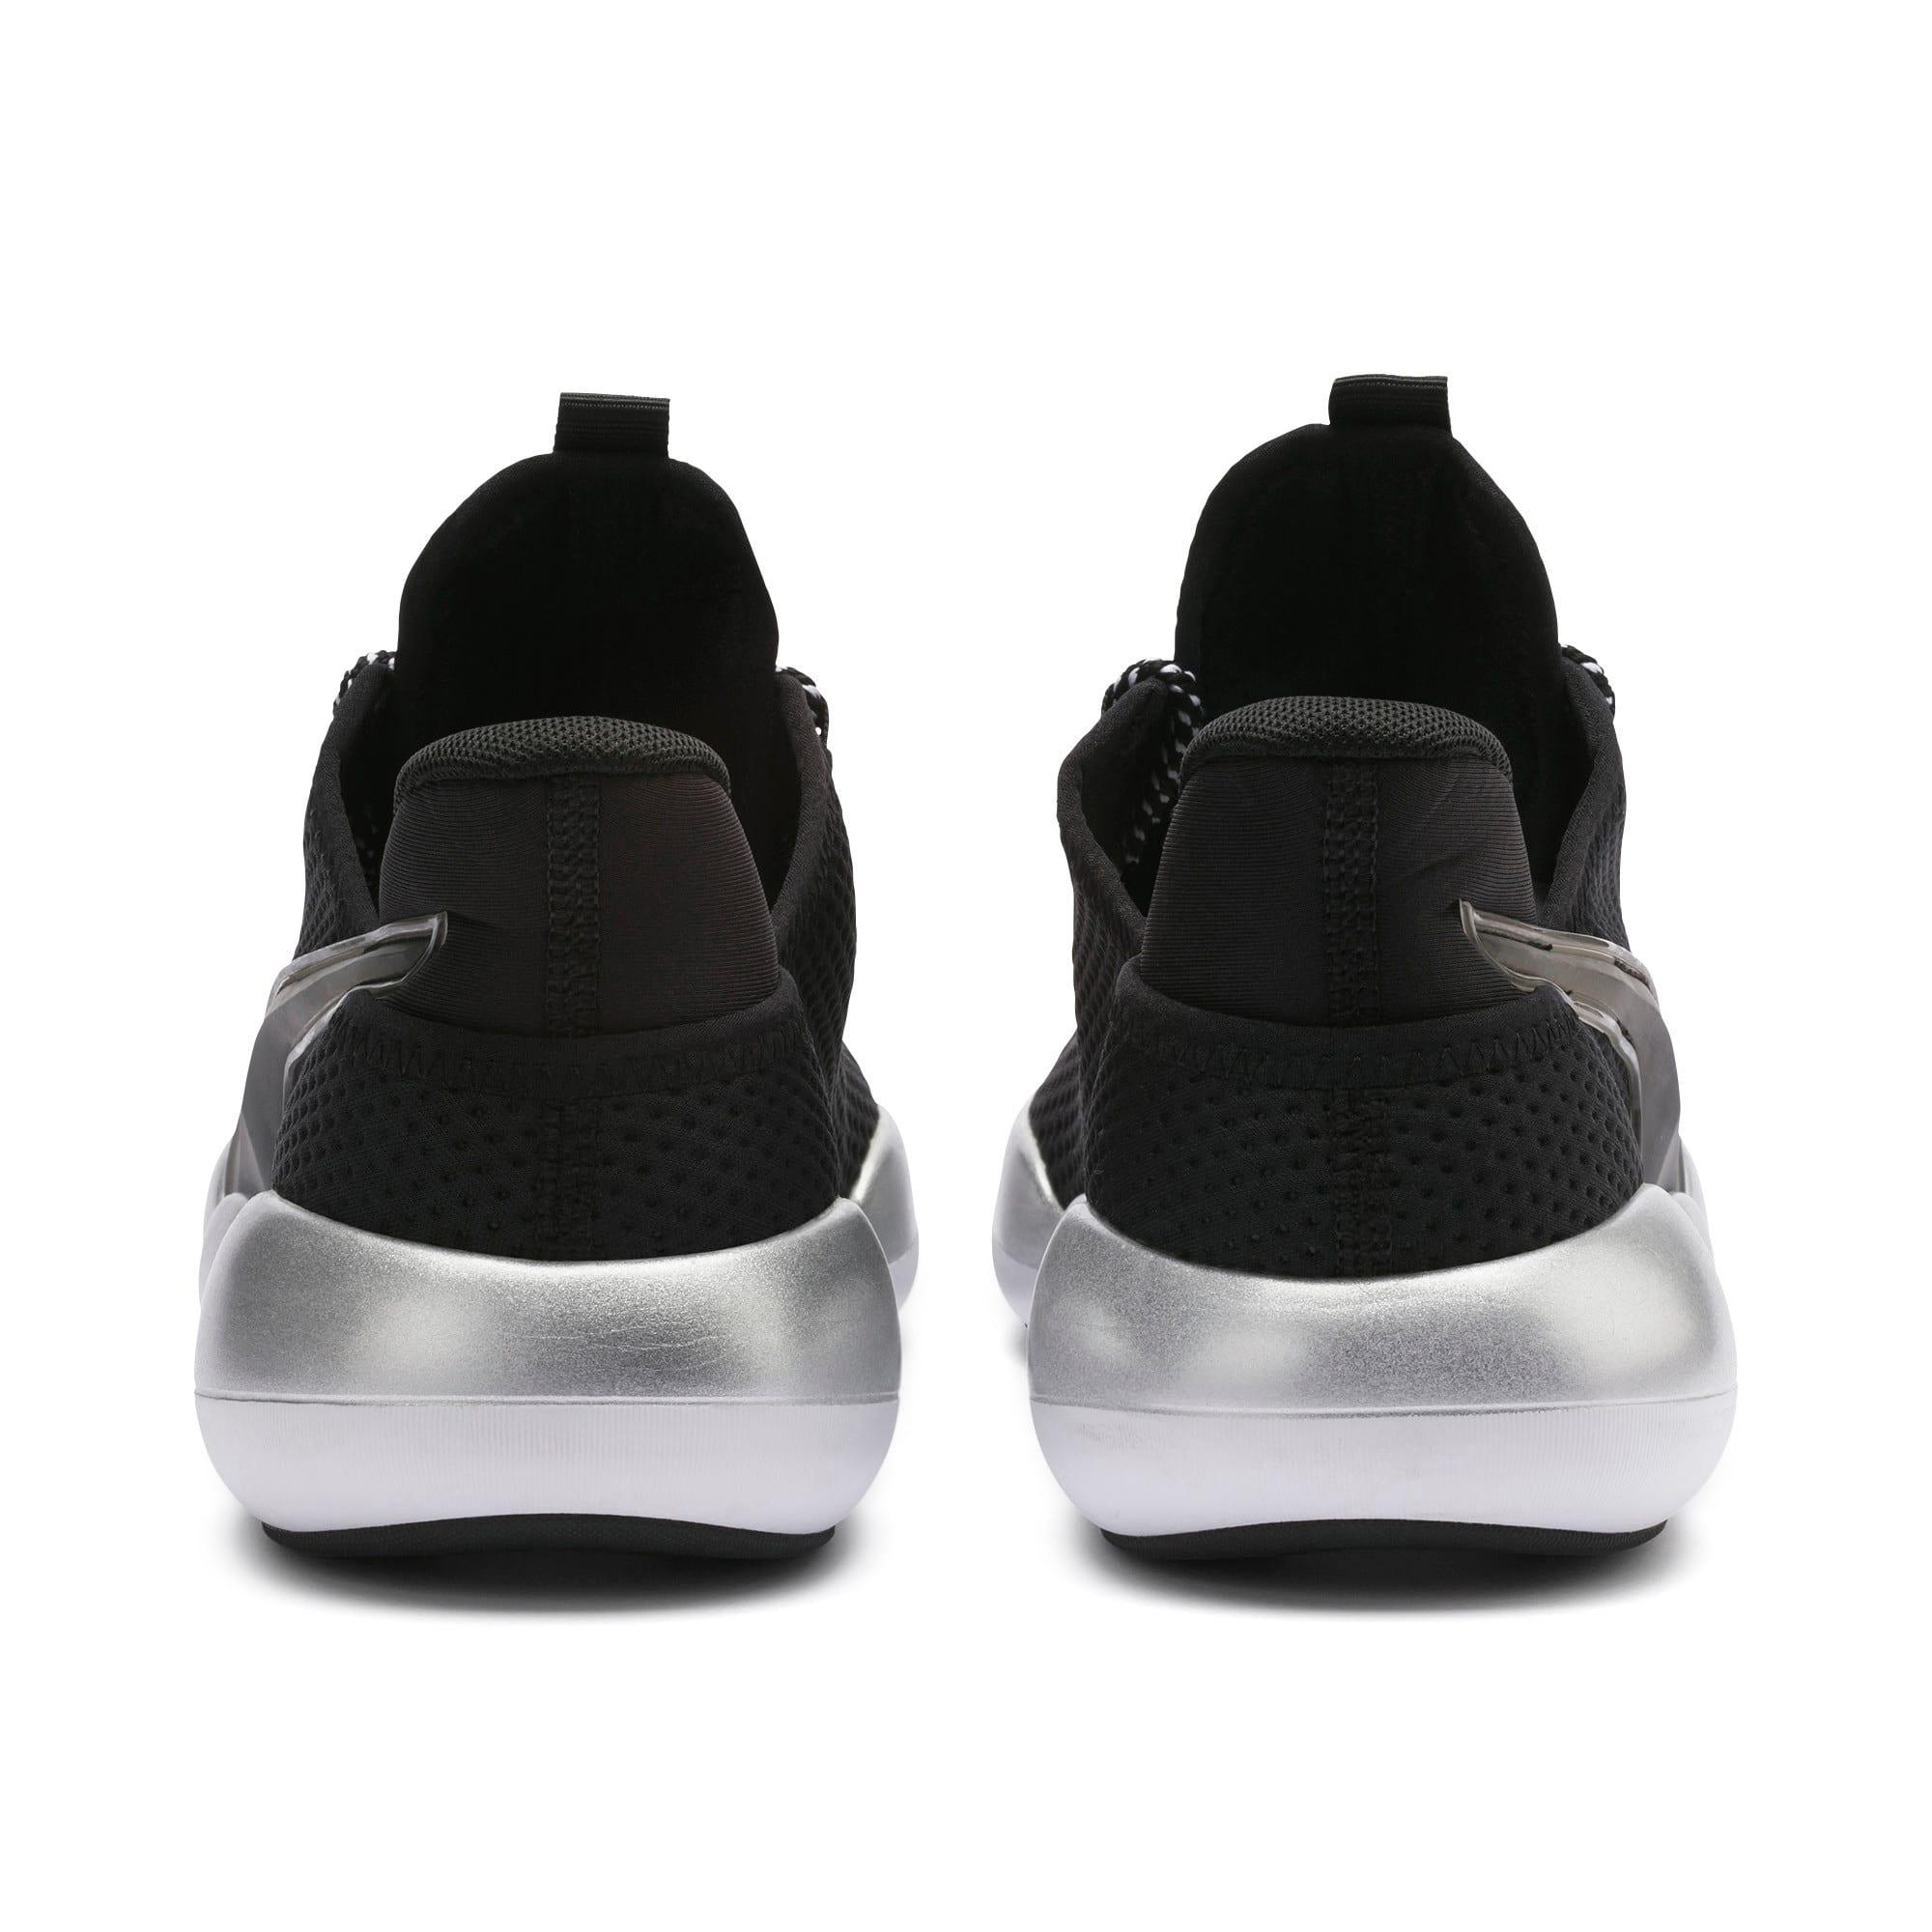 Imagen en miniatura 4 de Zapatillas de training de mujer Mode XT, Puma Black-Puma White, mediana